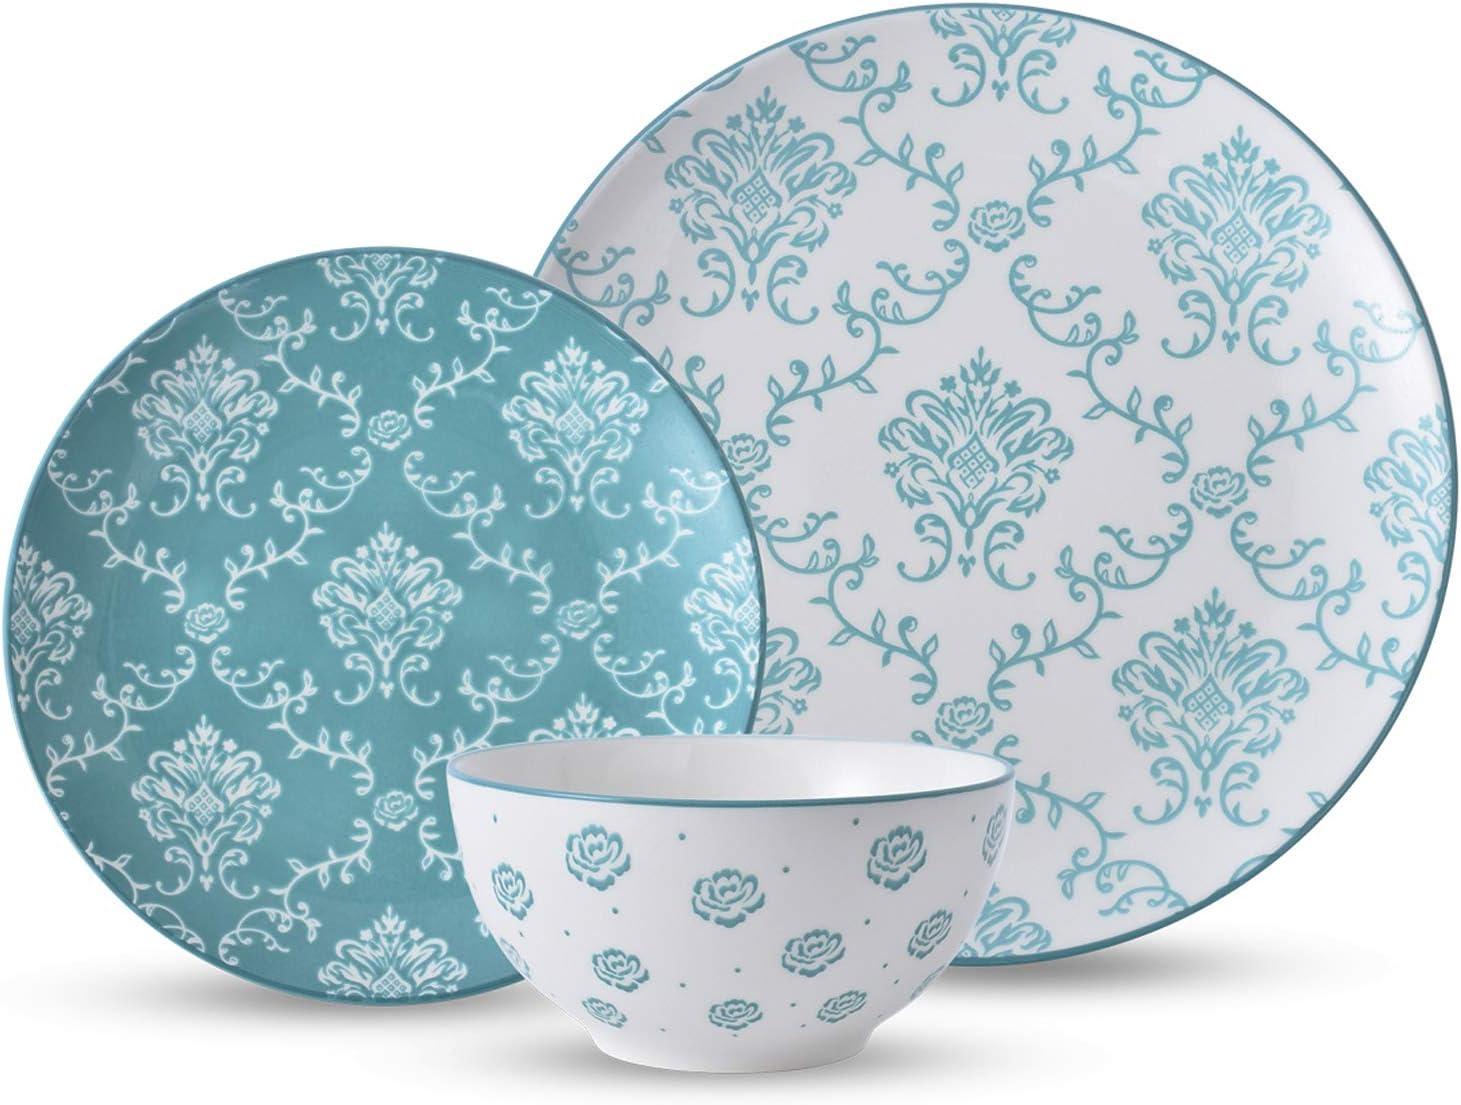 | Original Heart Dinnerware Set Dishes Set Green Stoneware Plate Set12pcs Bowl and plate set: Dinnerware Sets